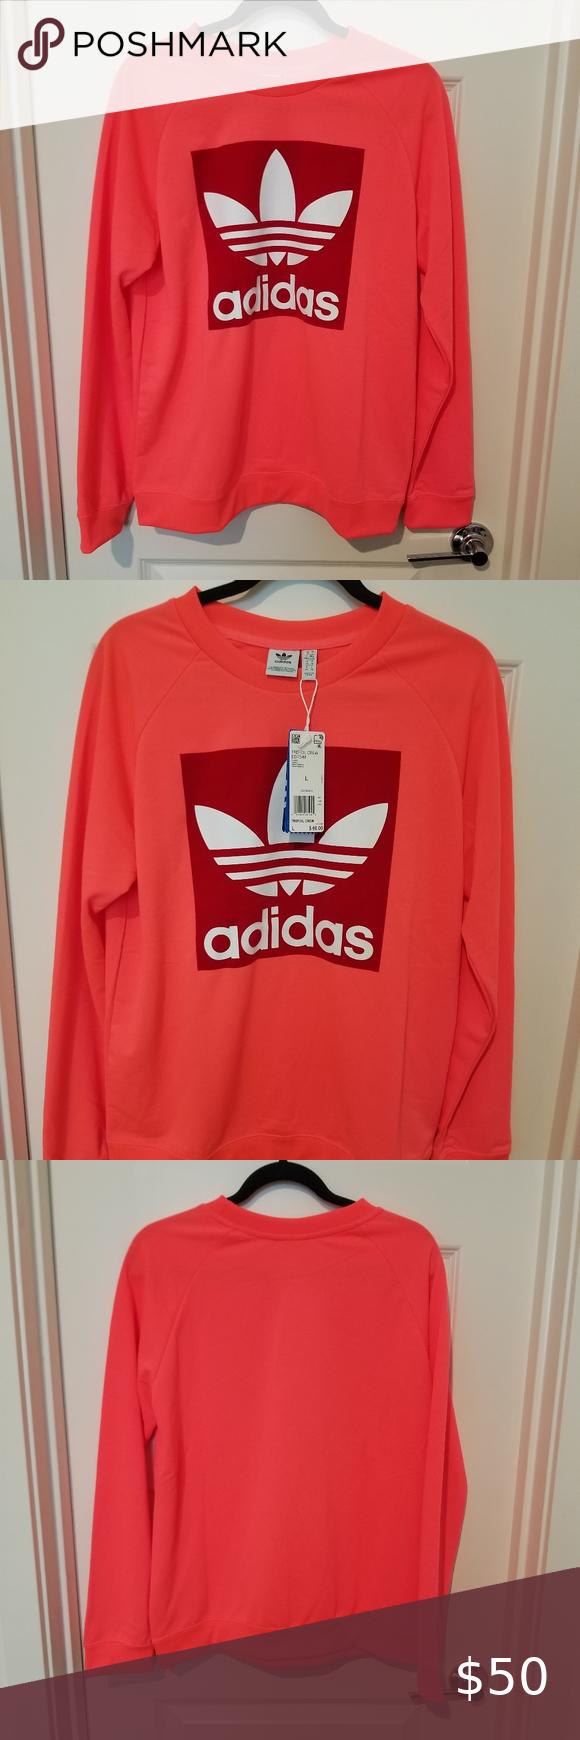 Adidas Trefoil Hot Neon Pink Sweatshirt Adidas Trefoil Crewneck Sweatshirt Hot Neon Pink With Red Velvet On The Fro Pink Sweatshirt Adidas Trefoil Sweatshirts [ 1740 x 580 Pixel ]